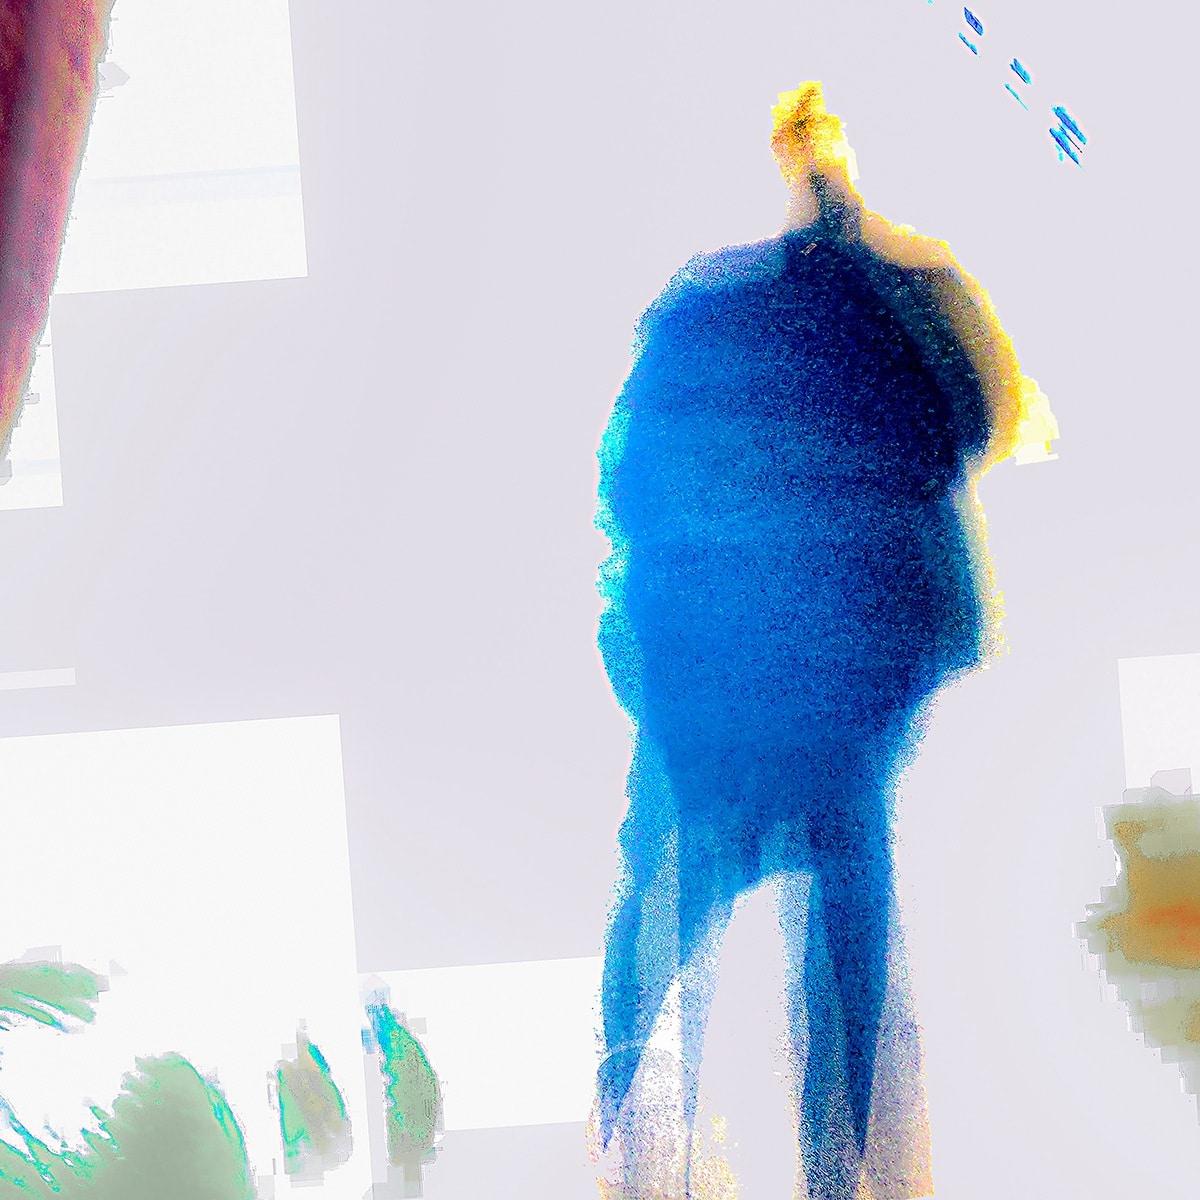 Shadow No. 07 // 30 x30, Fineart Print auf Photorag, 2018